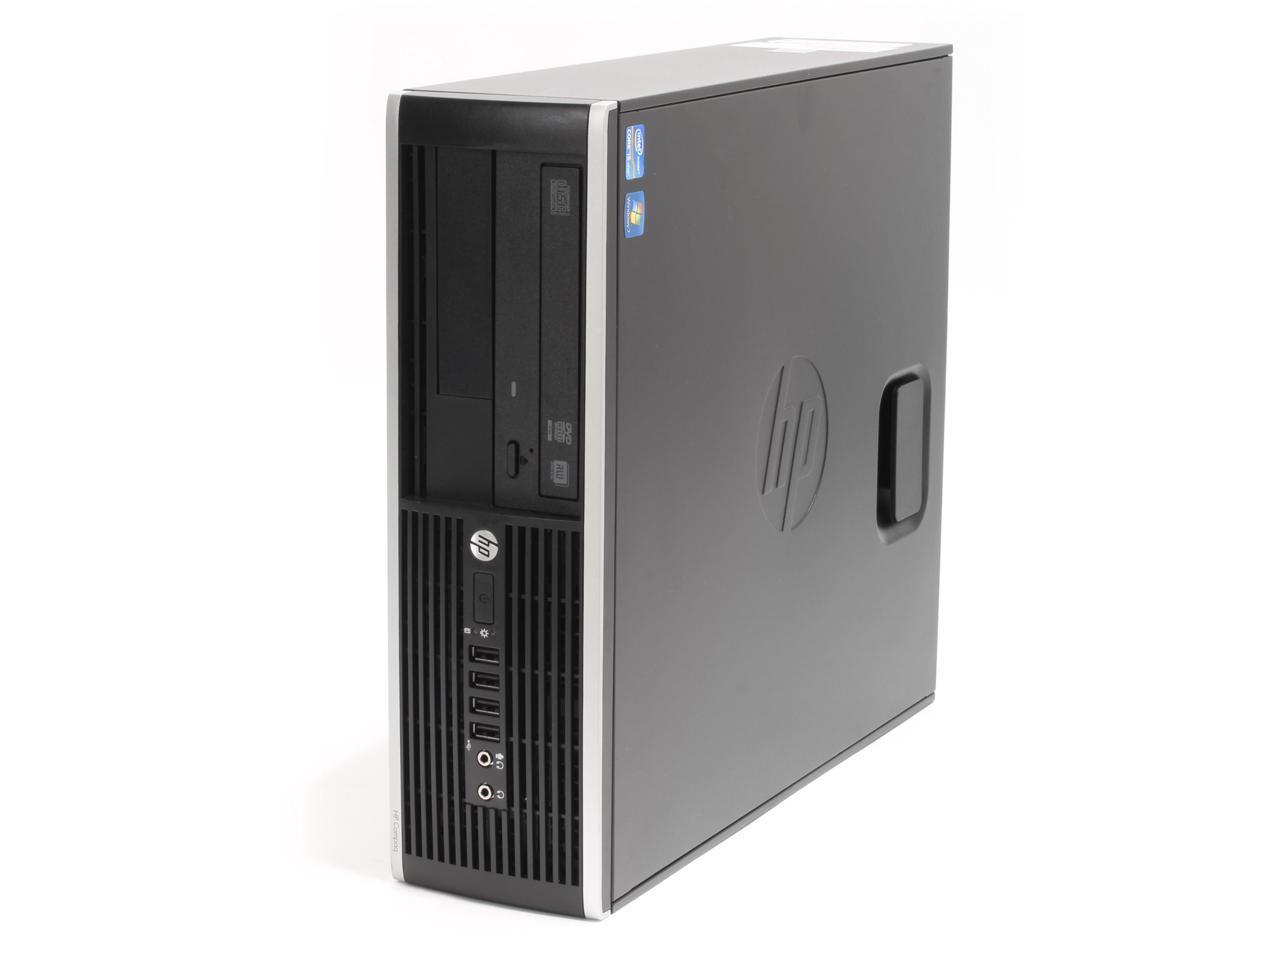 Refurbished Hp Elite 8300 Sff Desktop Quad Core Intel Core I7 3770 3 4ghz 16gb Ddr3 Ram 256gb Ssd Dvdrw Windows 10 Pro Newegg Com